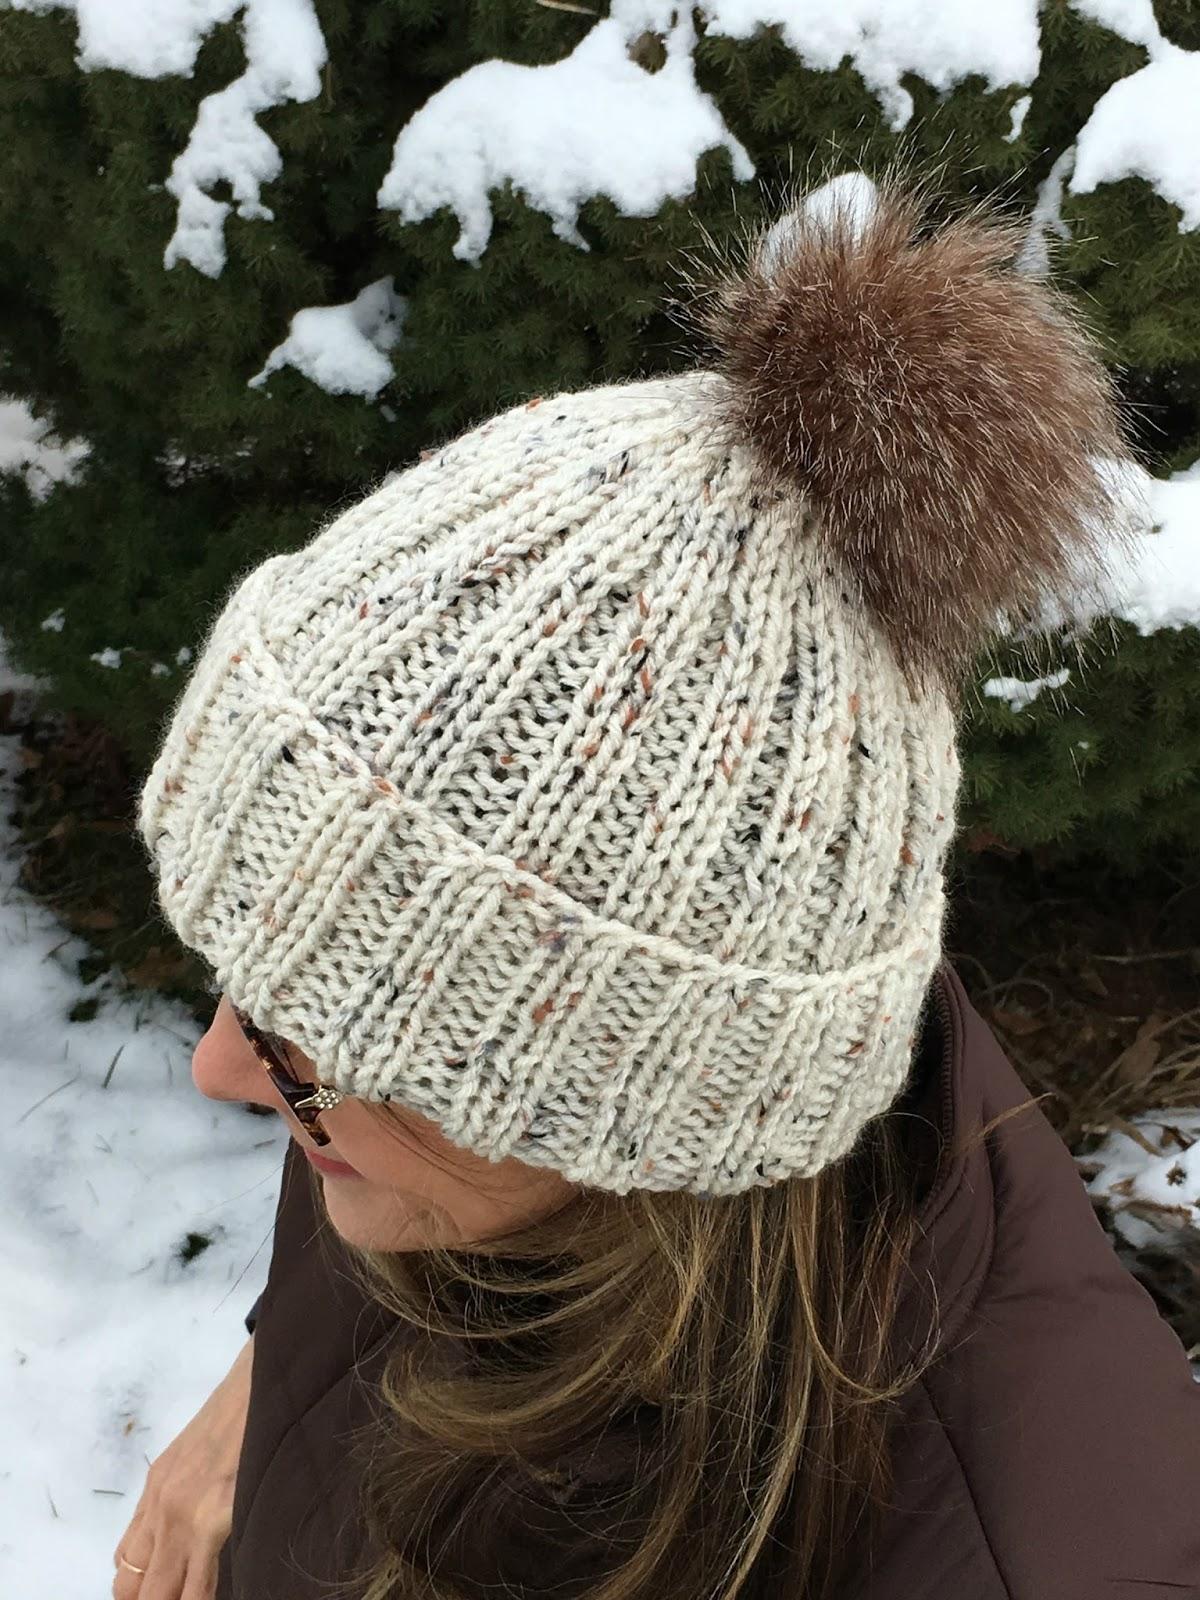 Knitted Hats | Grateful Prayer | Thankful Heart